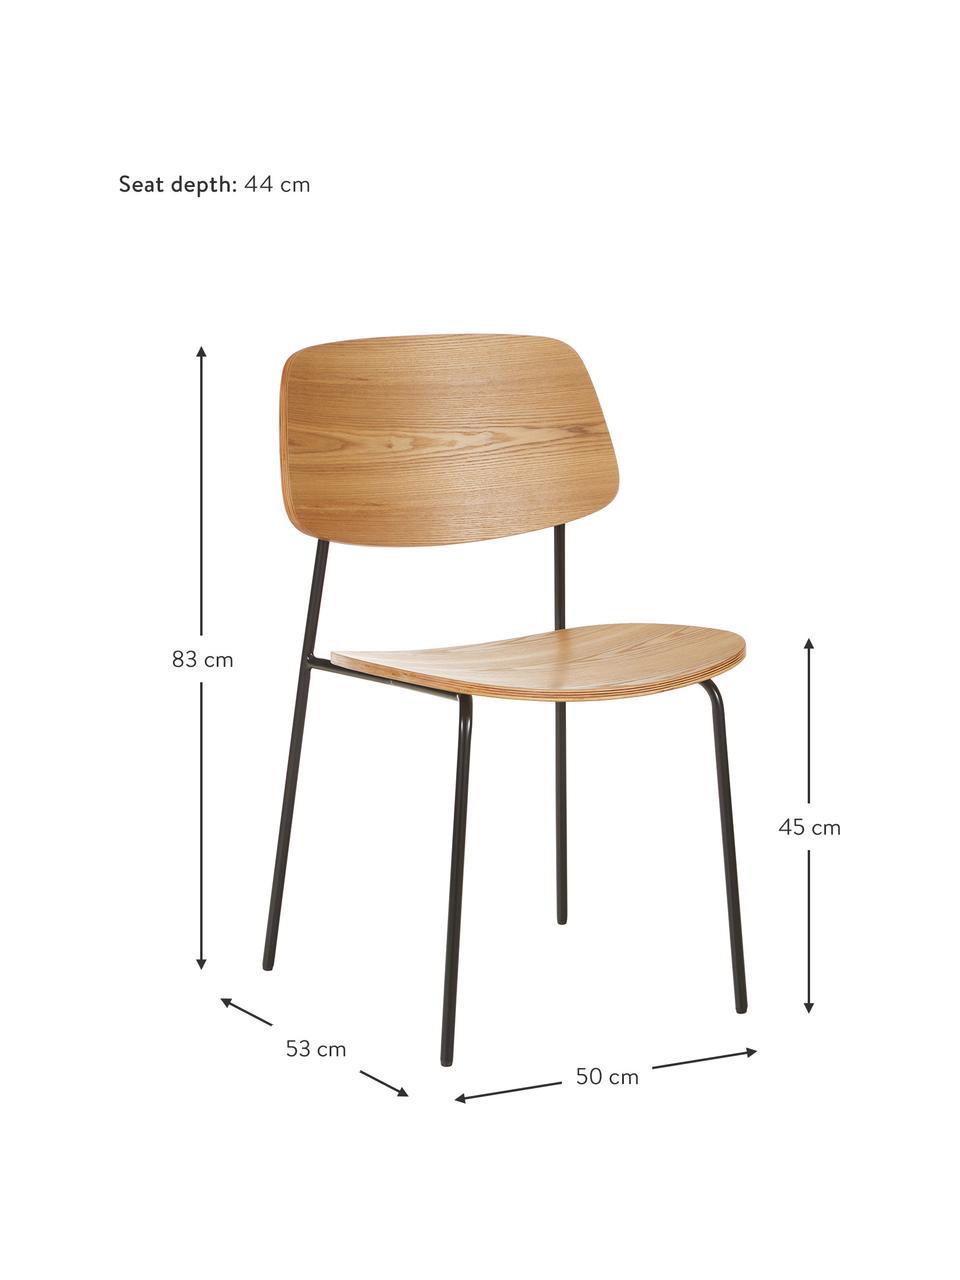 Holzstühle Nadja, 2 Stück, Sitzfläche: Sperrholz mit Eschenholzf, Beine: Metall, pulverbeschichtet, Eschenholzfunier, B 50 x T 53 cm